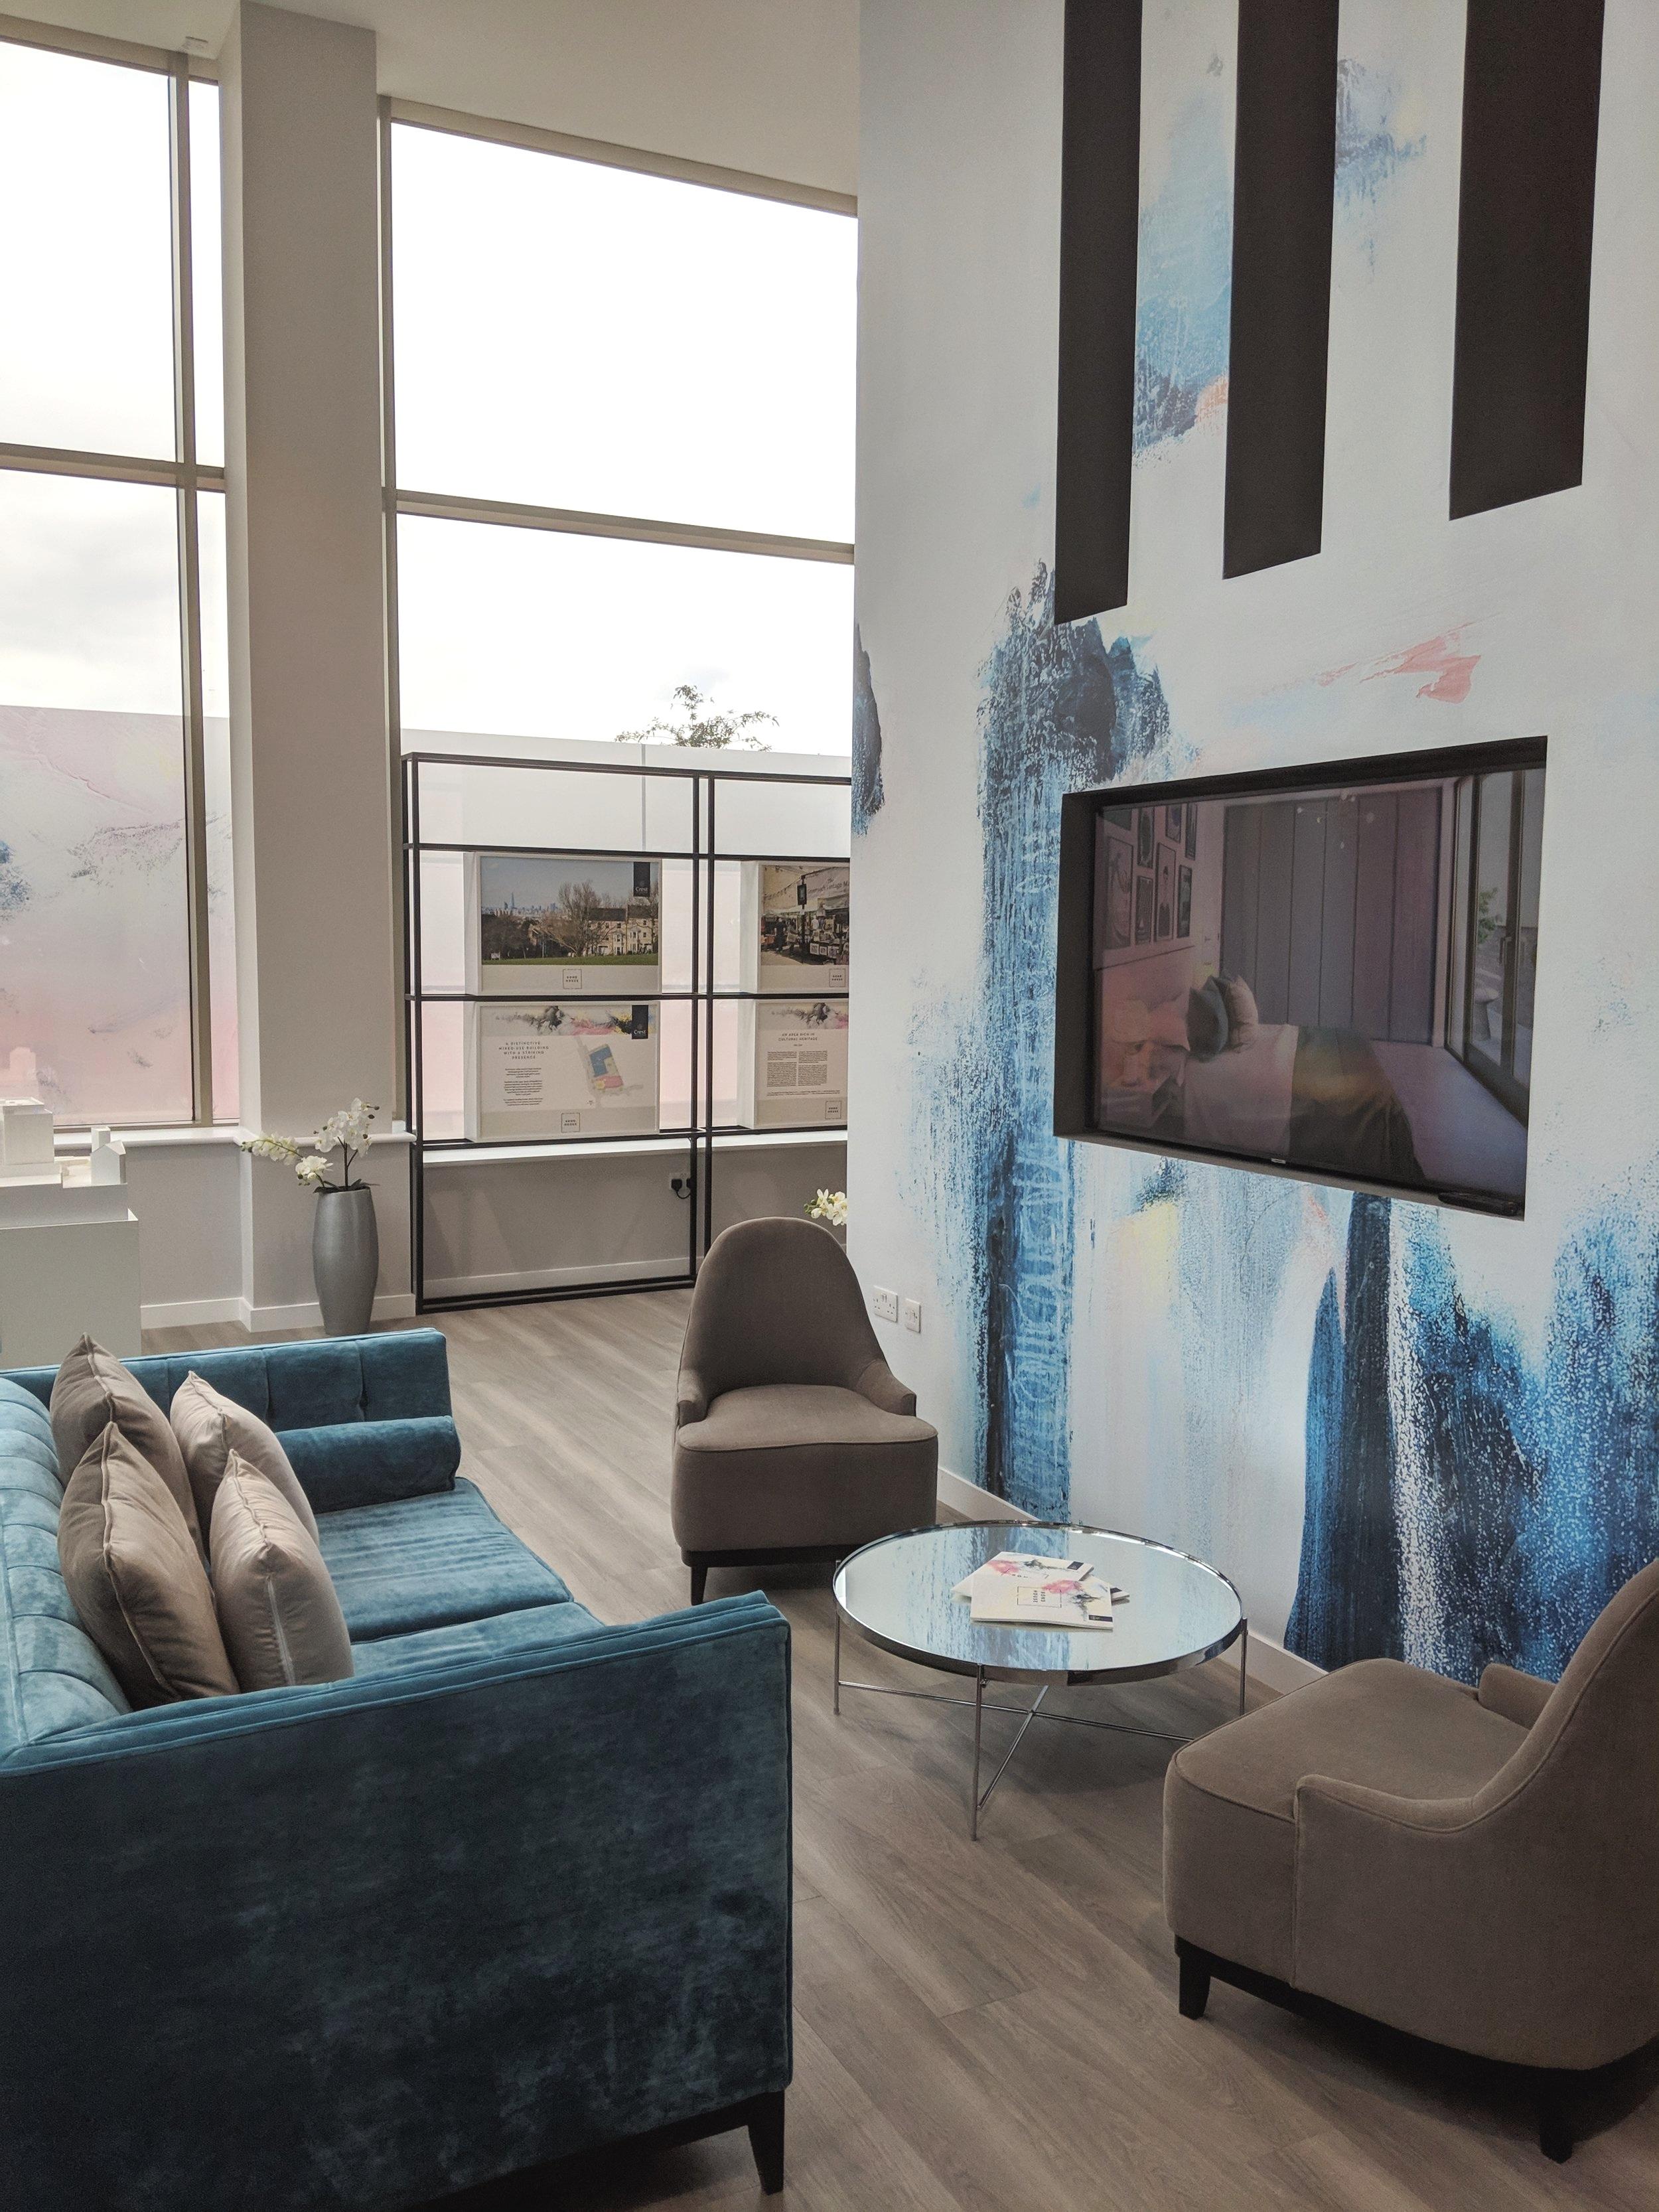 Marketing Suite - Crest nicholson / New cross gate